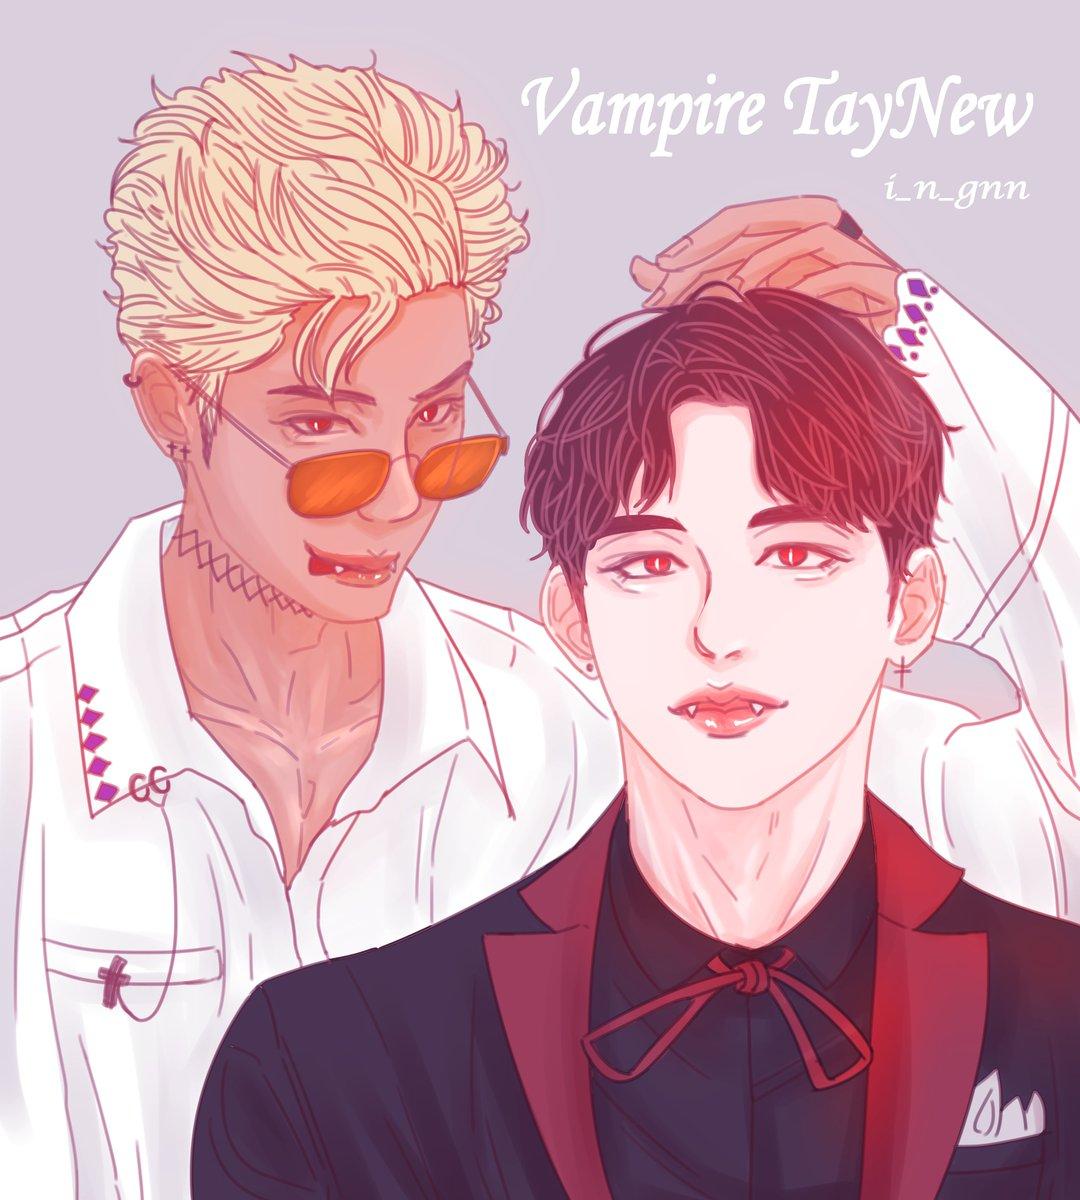 Vampire TayNew .ver   #Newwiee #New_Thitipoom #Tawan_v #taytawan   #เตนิว #โพก้า #TayNew #DarkBlueKiss #TayNewFanart  @Tawan_V  @New_Thitipoom<br>http://pic.twitter.com/IpHIkxLhHx